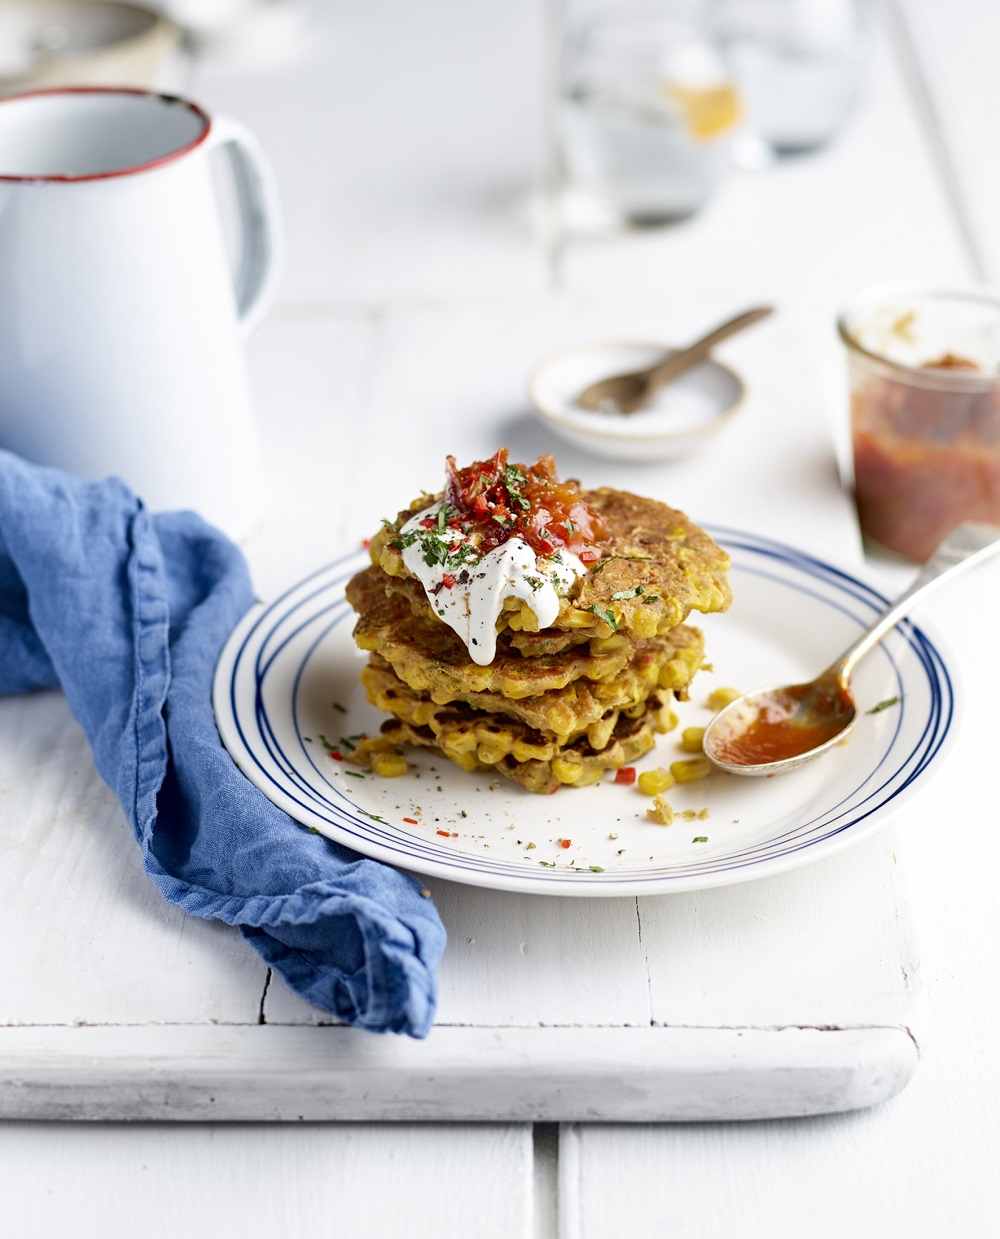 Sweetcorn, Shallot & Chilli Fritters With Tomato & Shallot Chutney